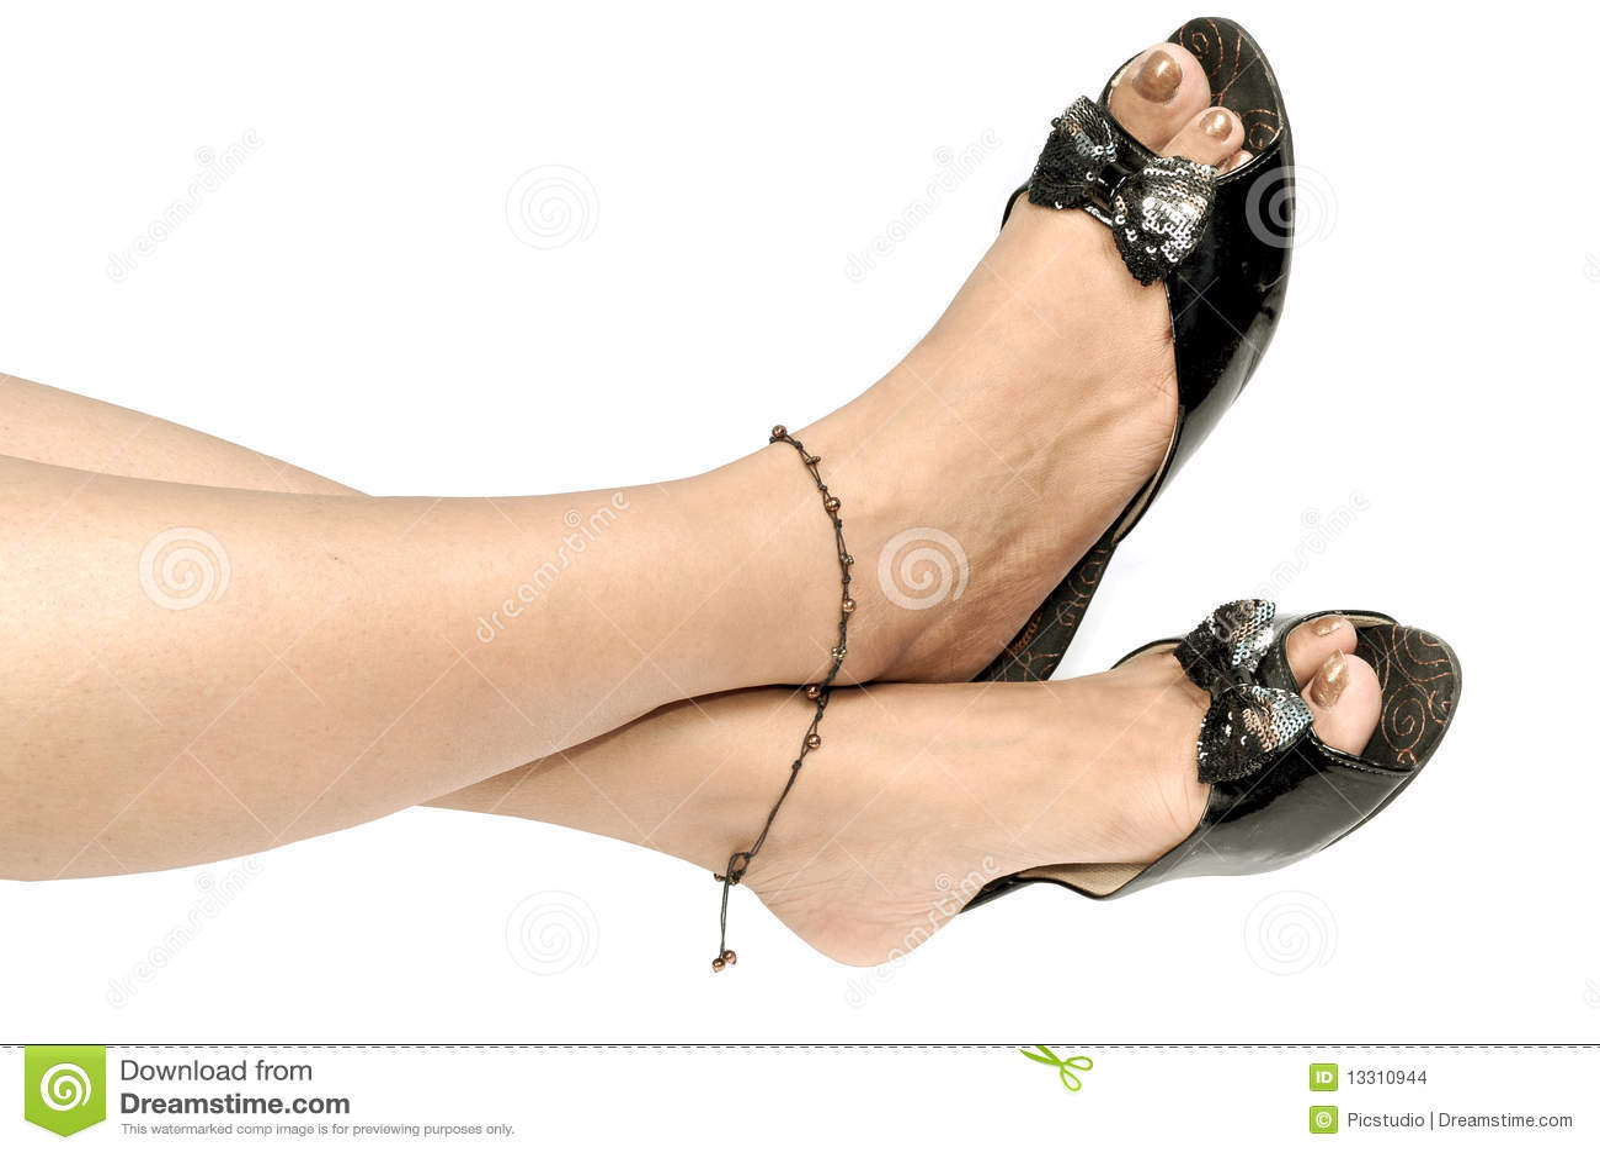 Фетиш женские ножки онлайн 19 фотография